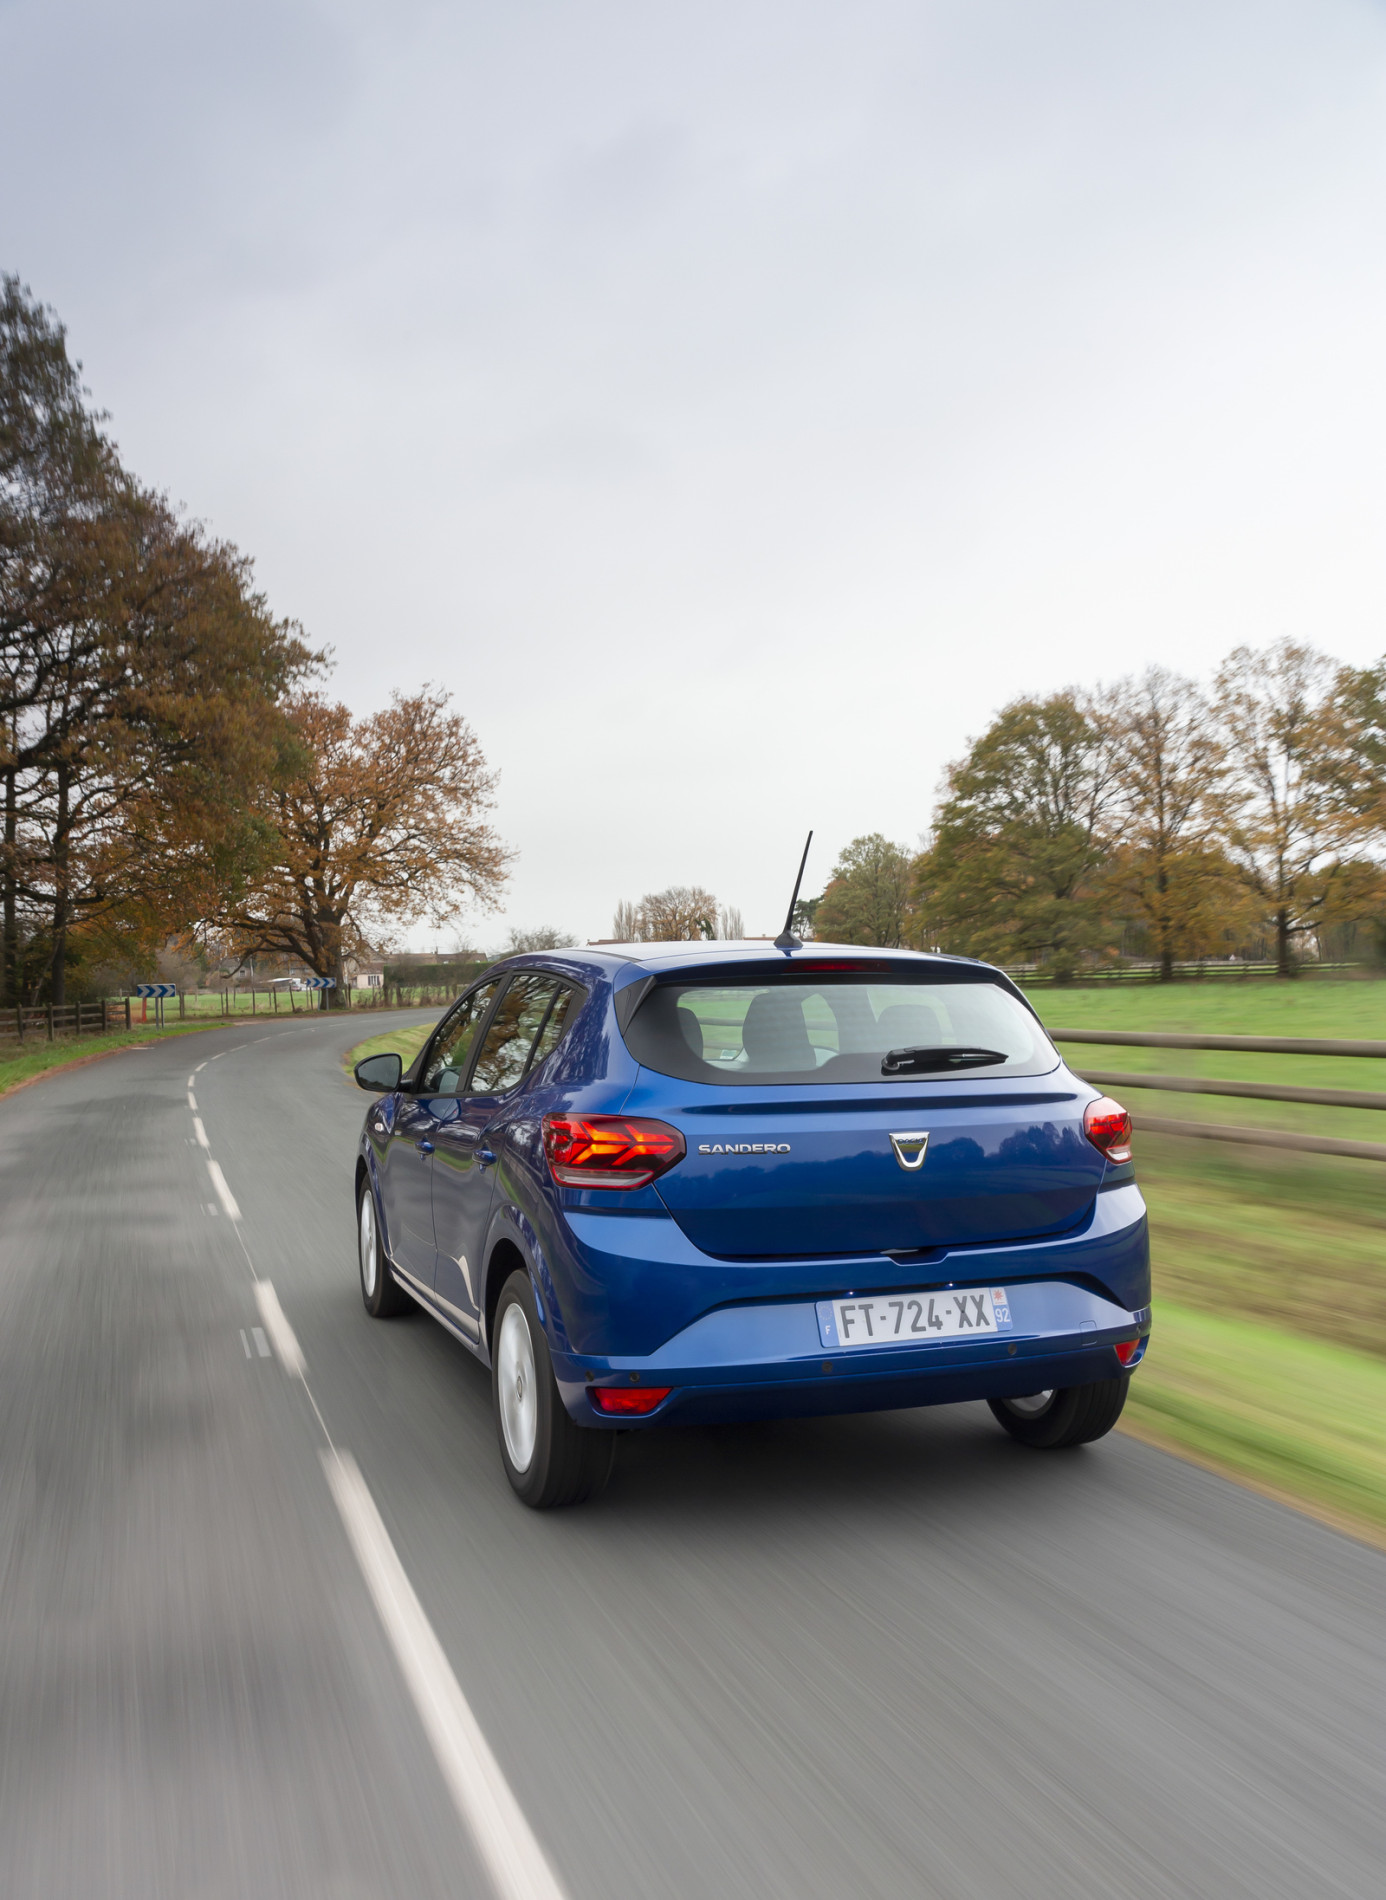 Noile Dacia Sandero si Dacia Sandero Stepway - Noile Dacia Sandero si Dacia Sandero Stepway